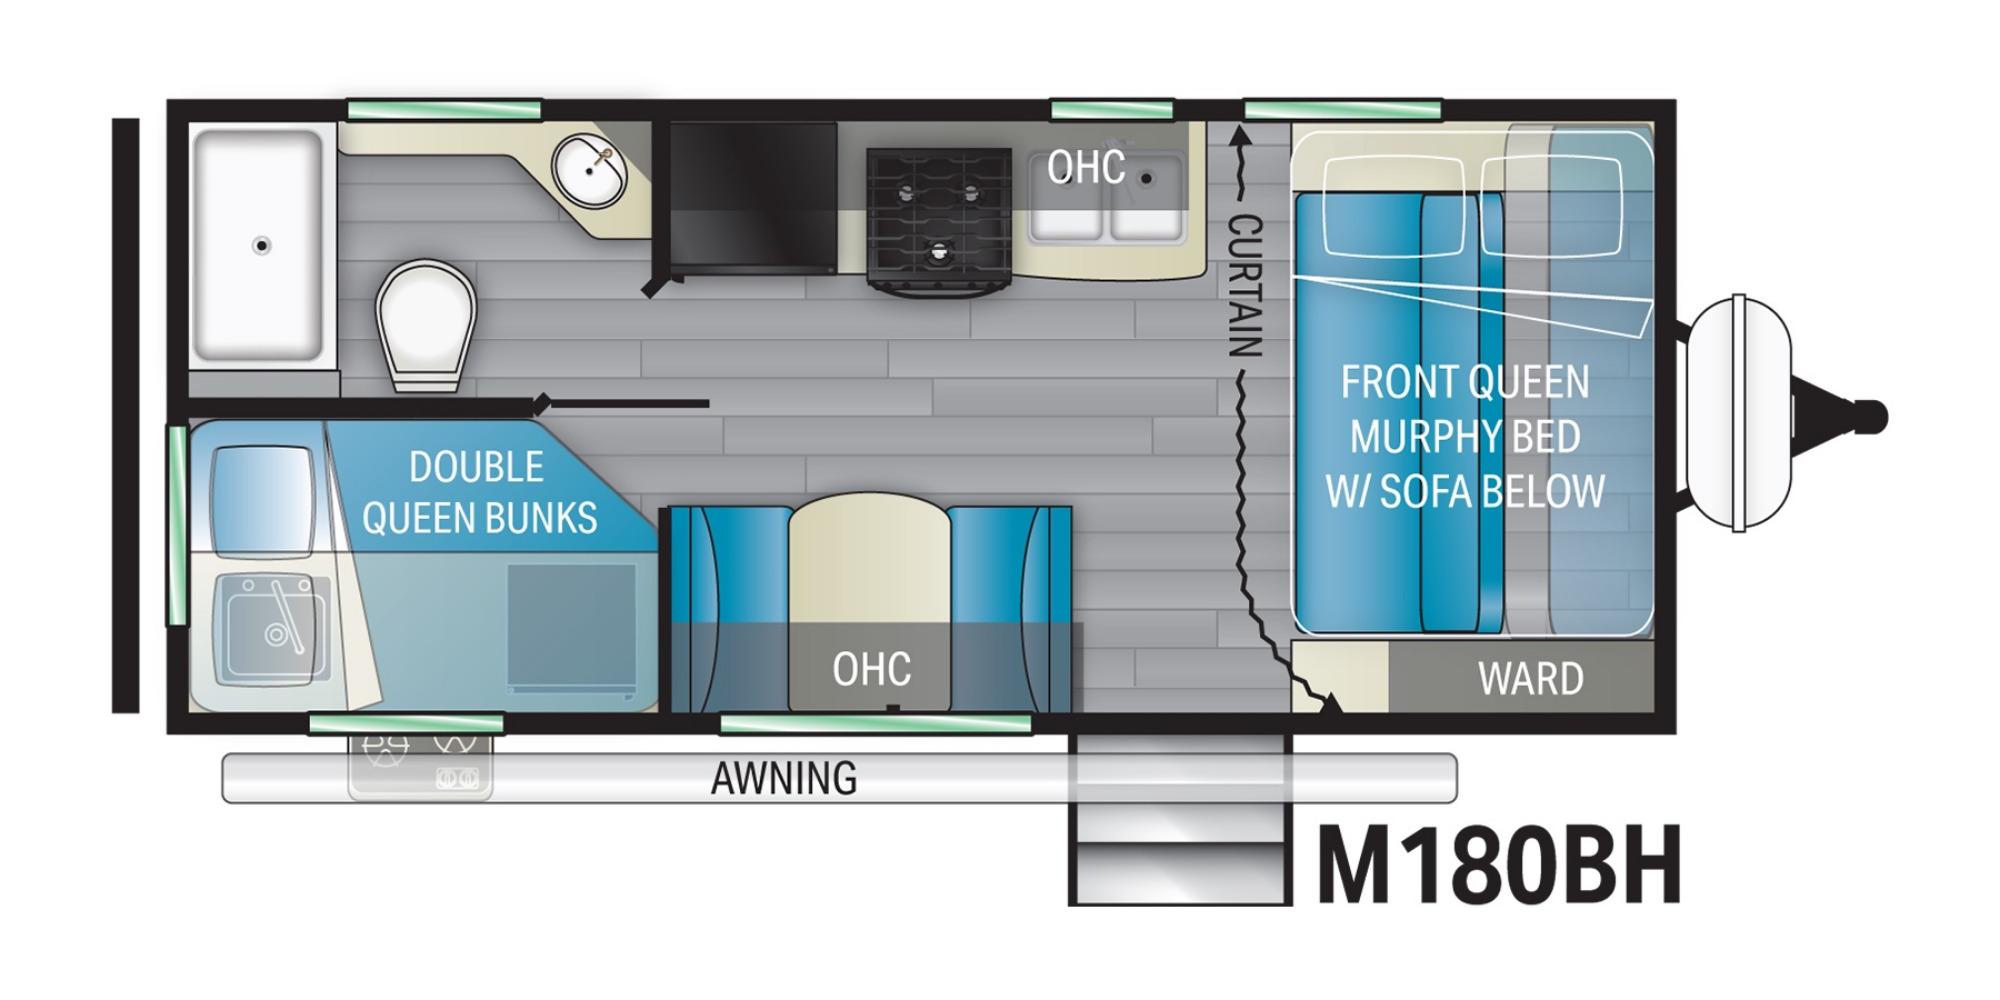 View Floor Plan for 2022 HEARTLAND MALLARD M180BH